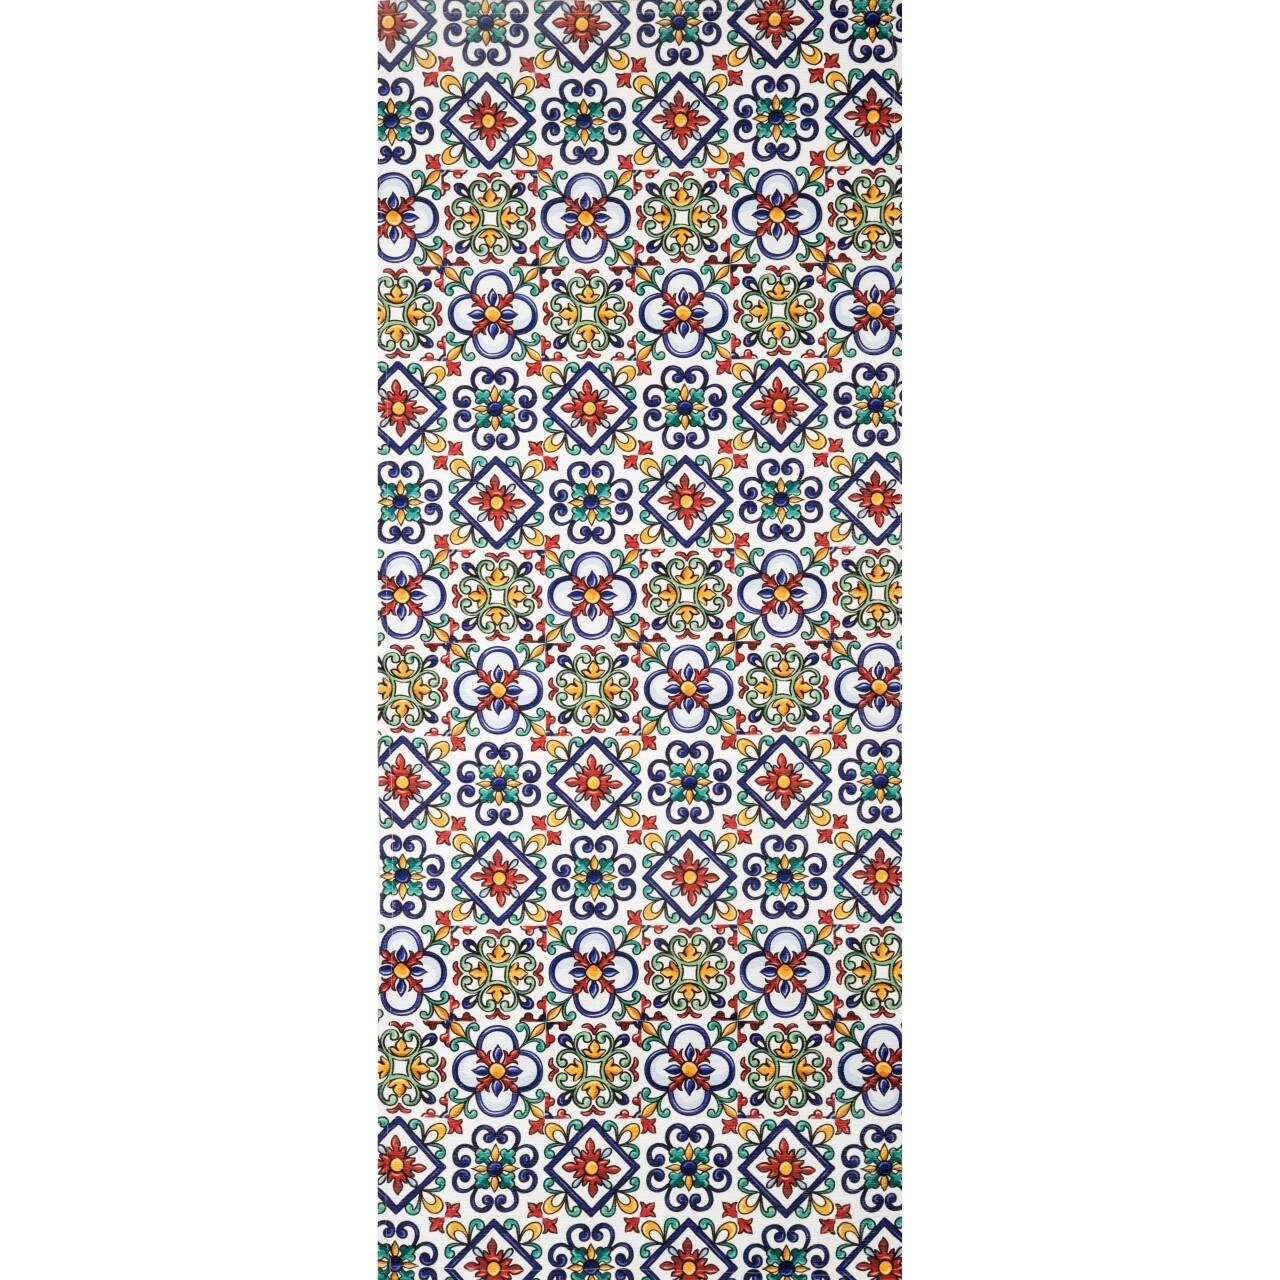 Covor rezistent Webtappeti CERAMICA1 CM 58x190 cm, multicolor